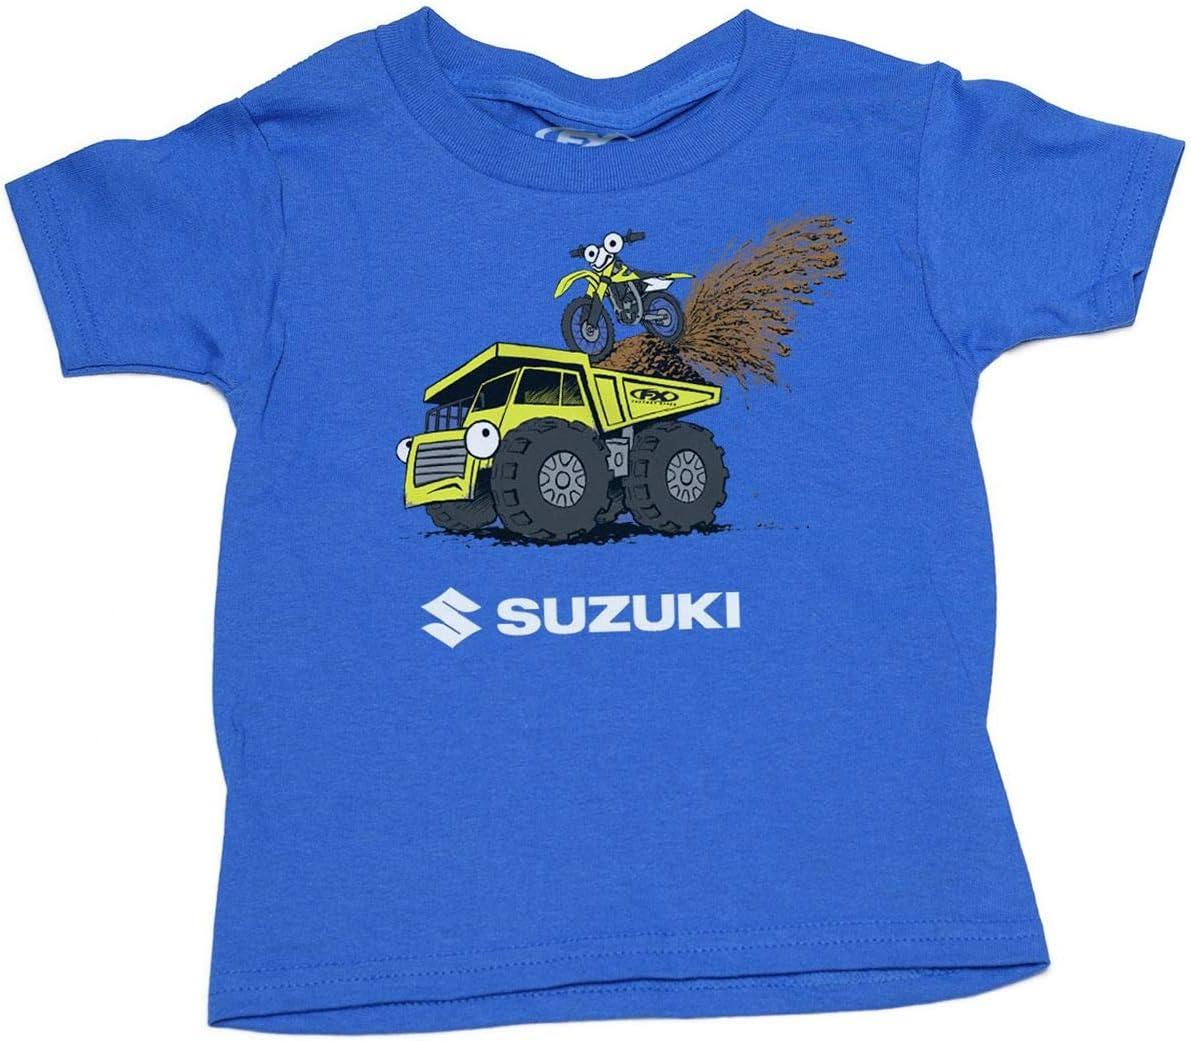 Factory Effex Suzuki Earthmover Toddler T-Shirt